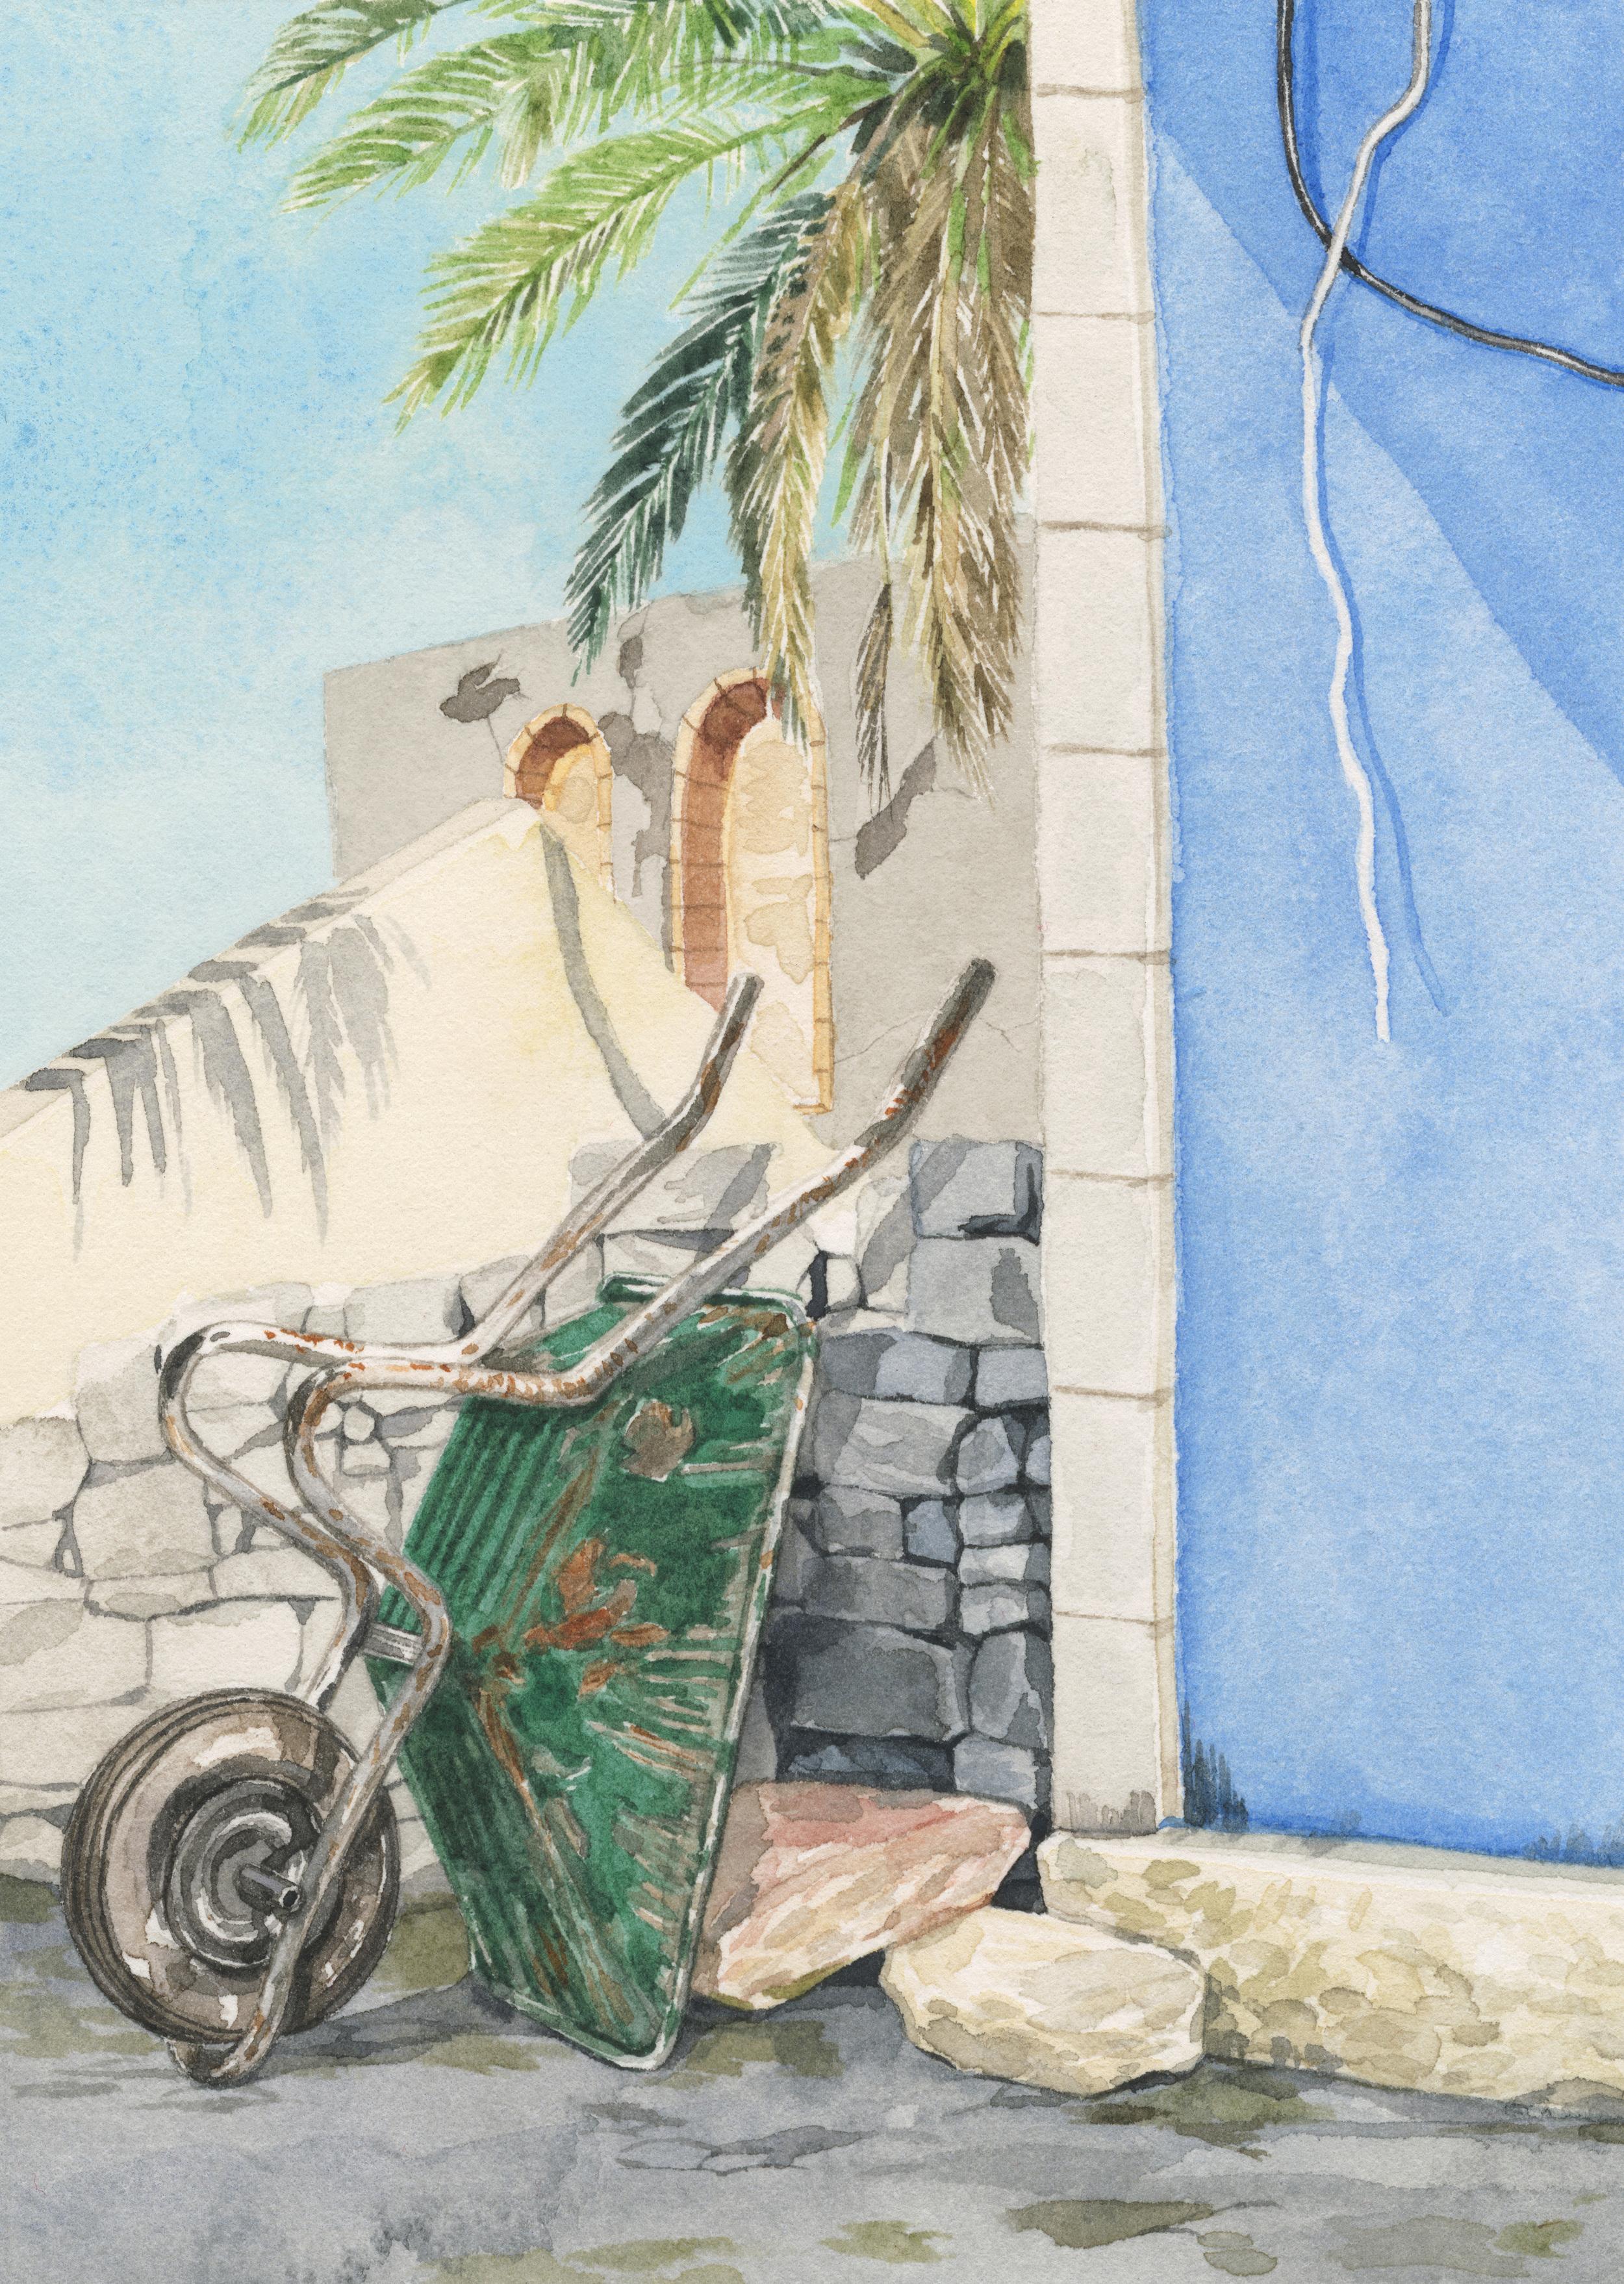 cabo-wheelbarrow2-web.jpg